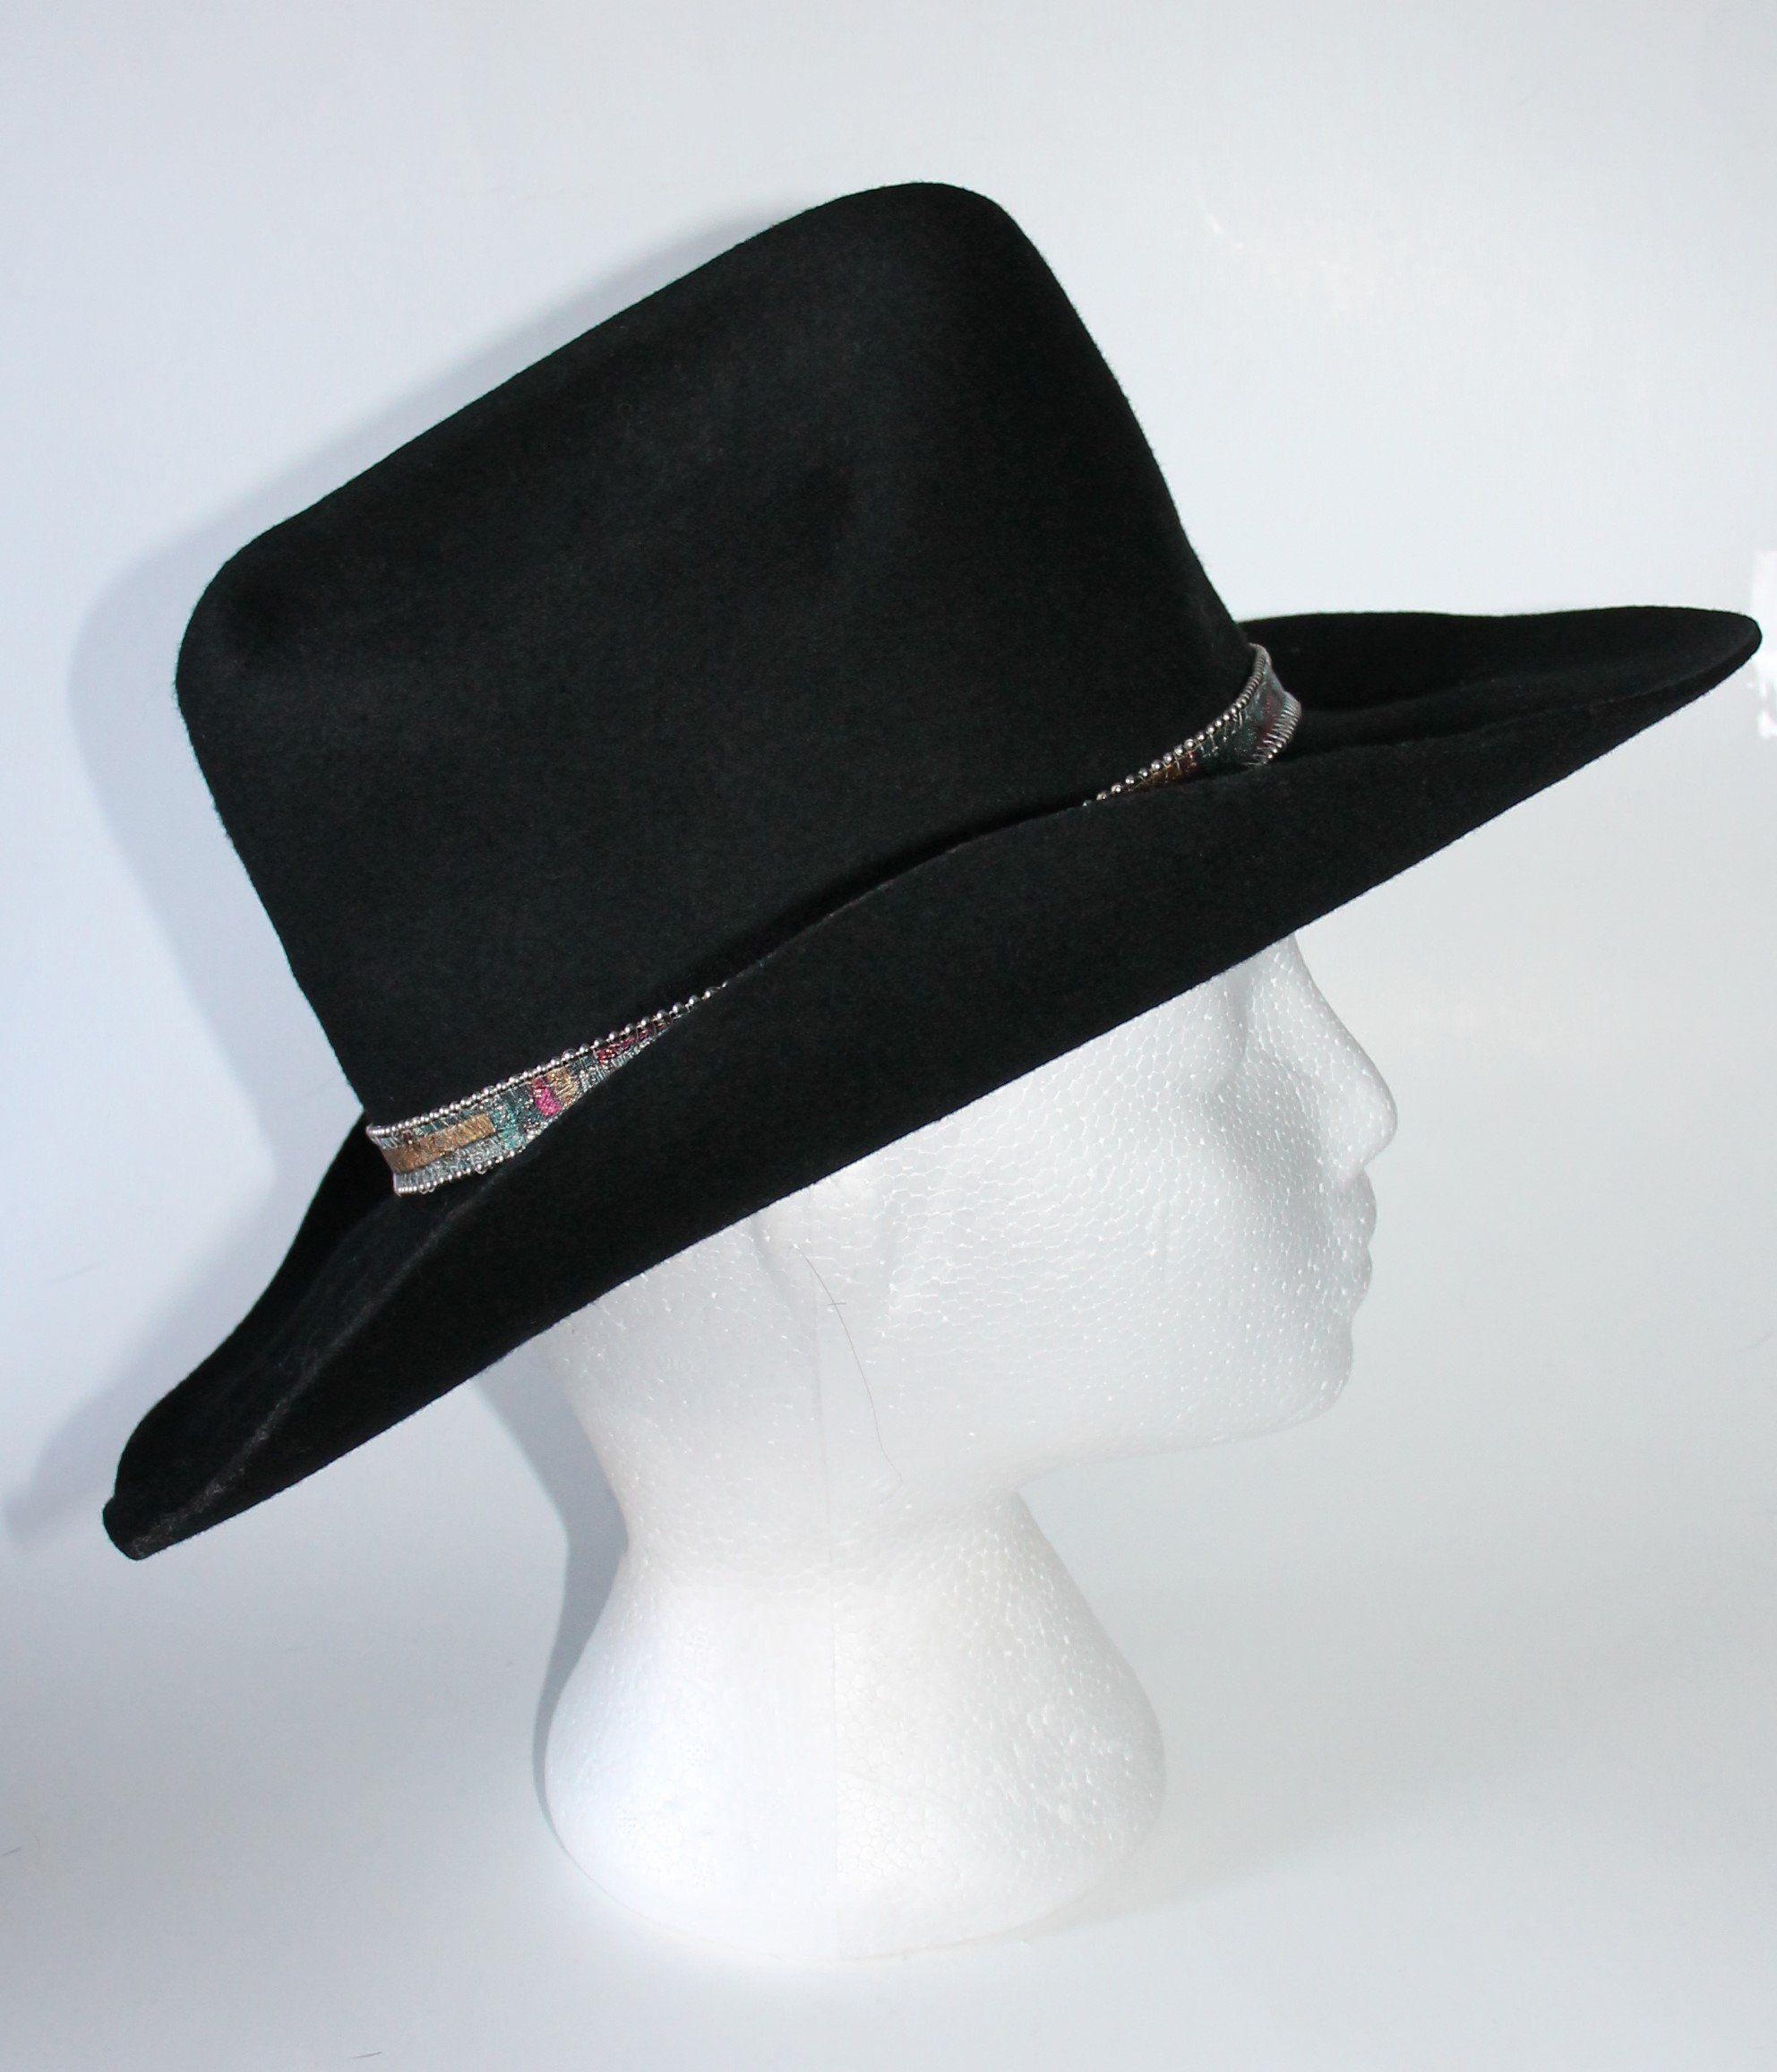 d47c346b2 Black Cowboy Hat by Western Express Inc Size 7 Wool Western in 2019 ...